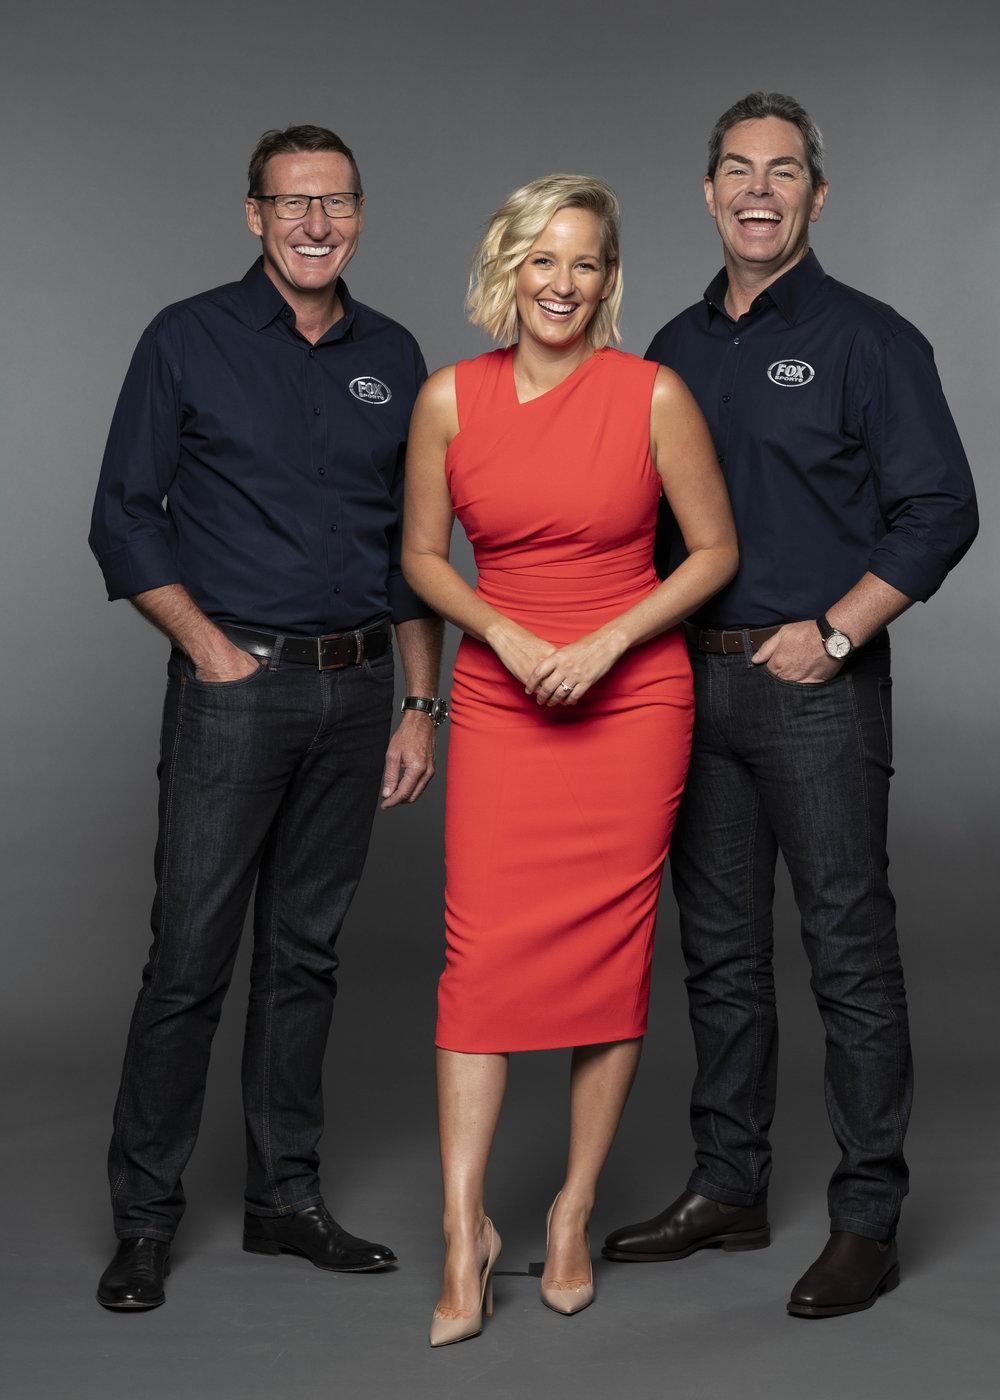 Mark Skaife, Jess Yates and Craig Lowndes  images - Fox Sports